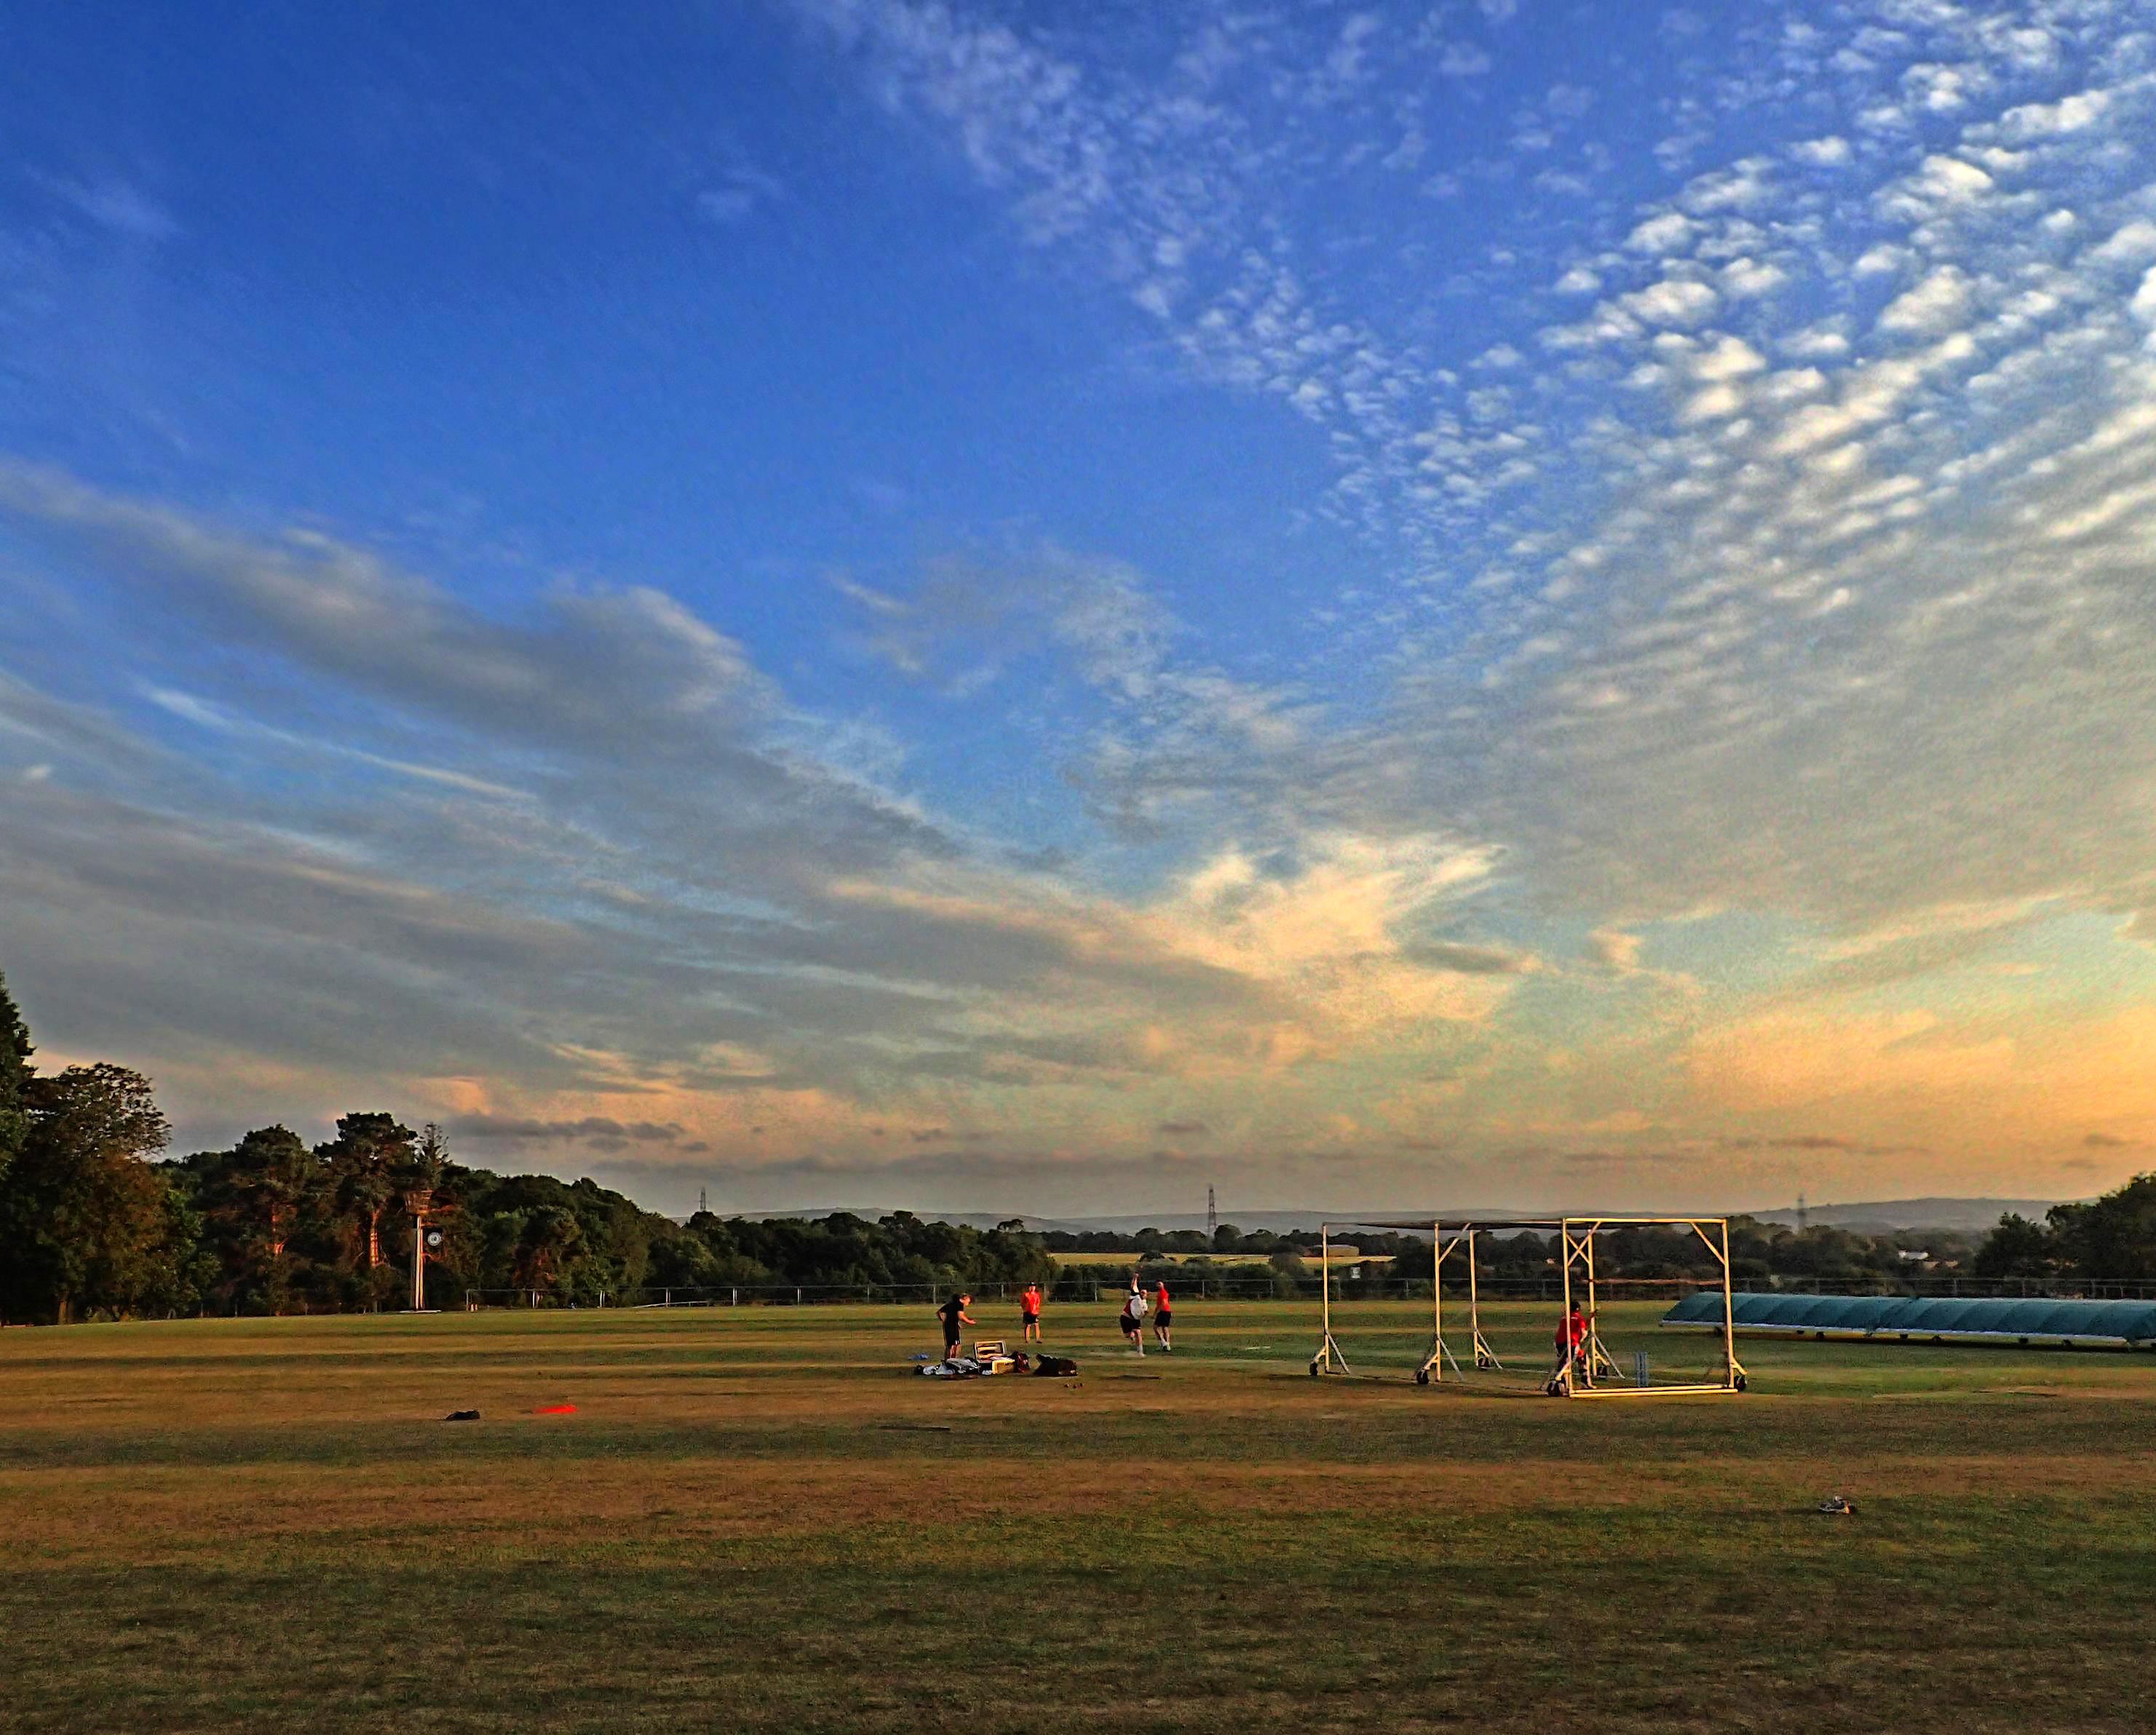 Cricket practice at Victoria Pleasure Ground